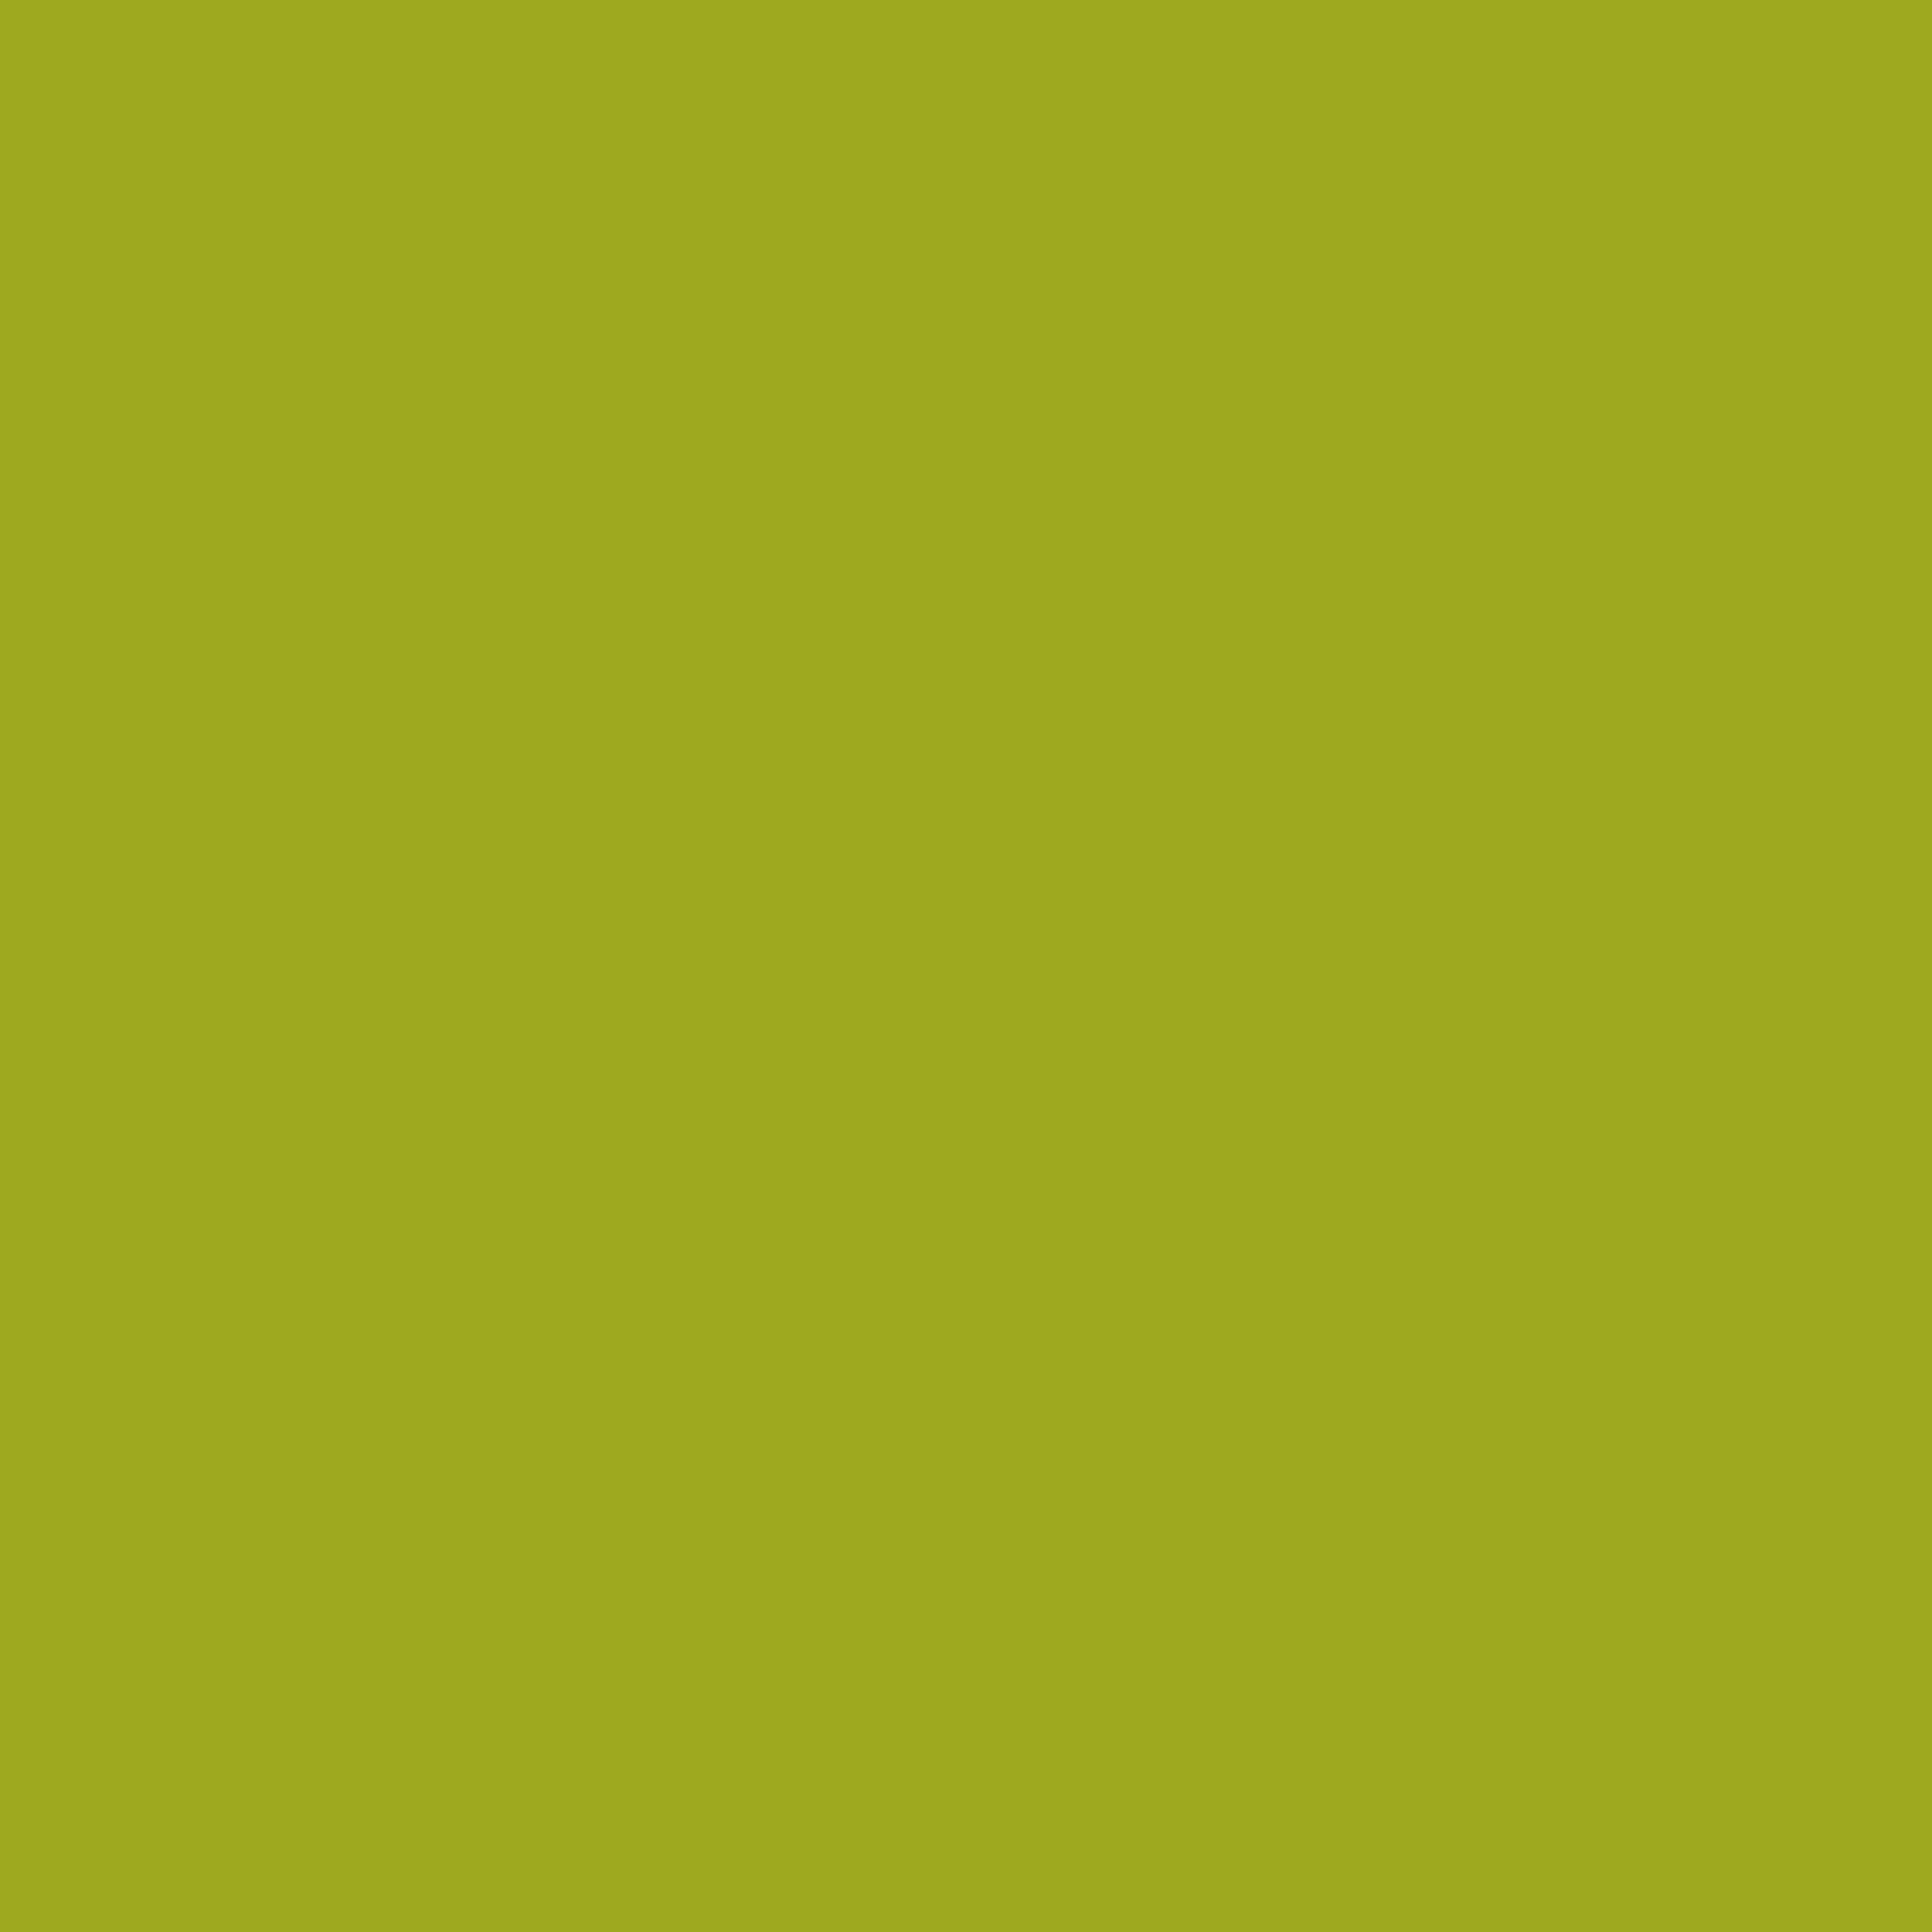 3600x3600 Citron Solid Color Background